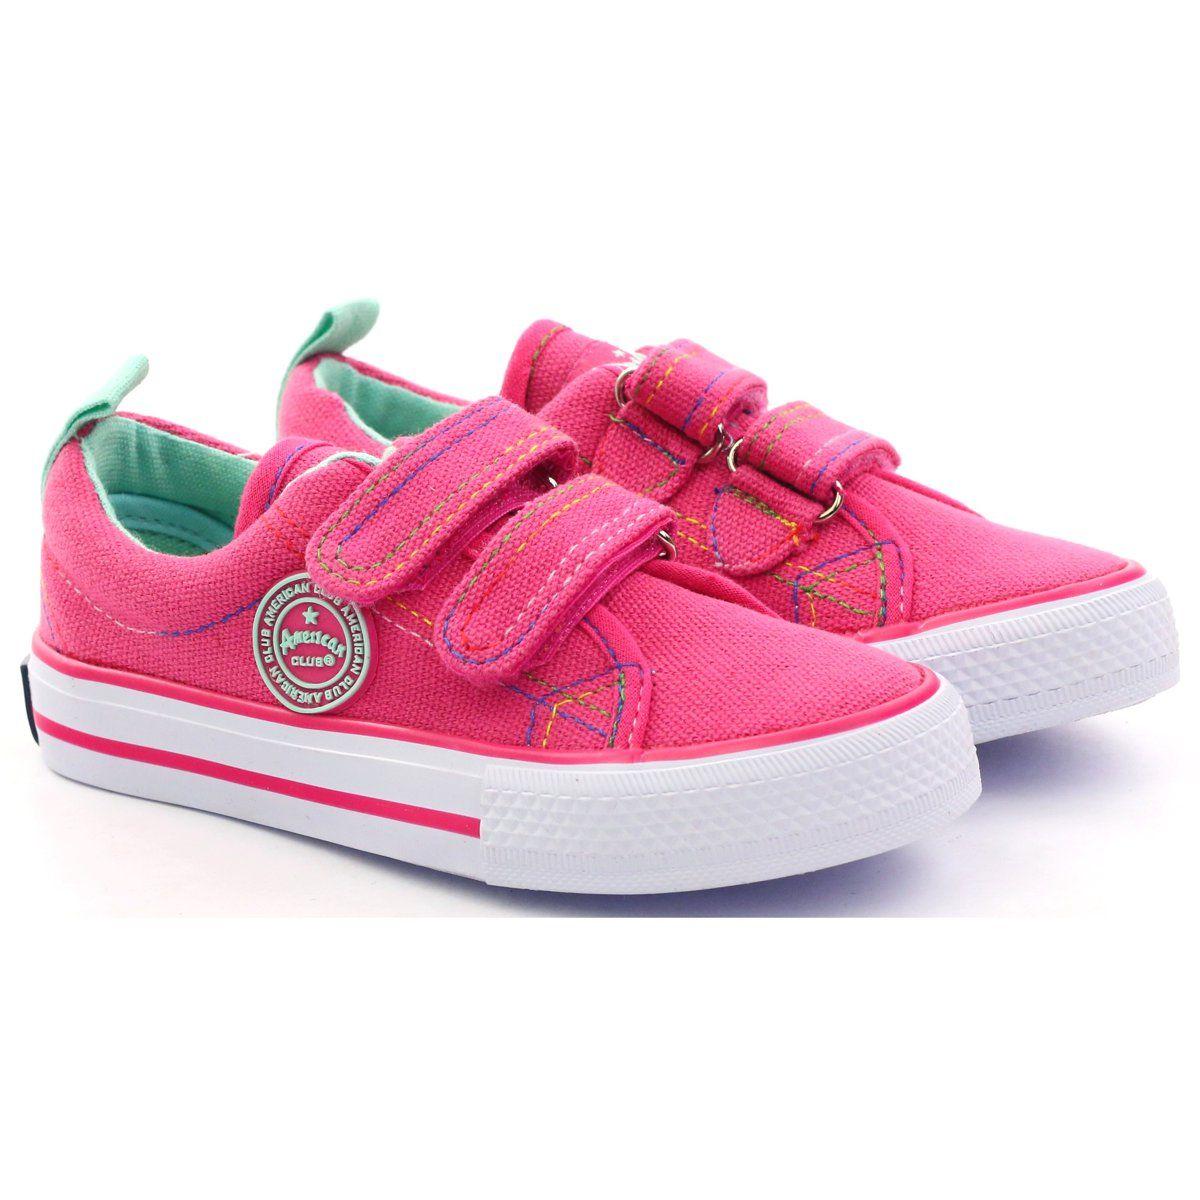 American Club Trampki Tenisowki Rzepy American Rozowe Biale Kid Shoes Childrens Sneakers Club Shoes